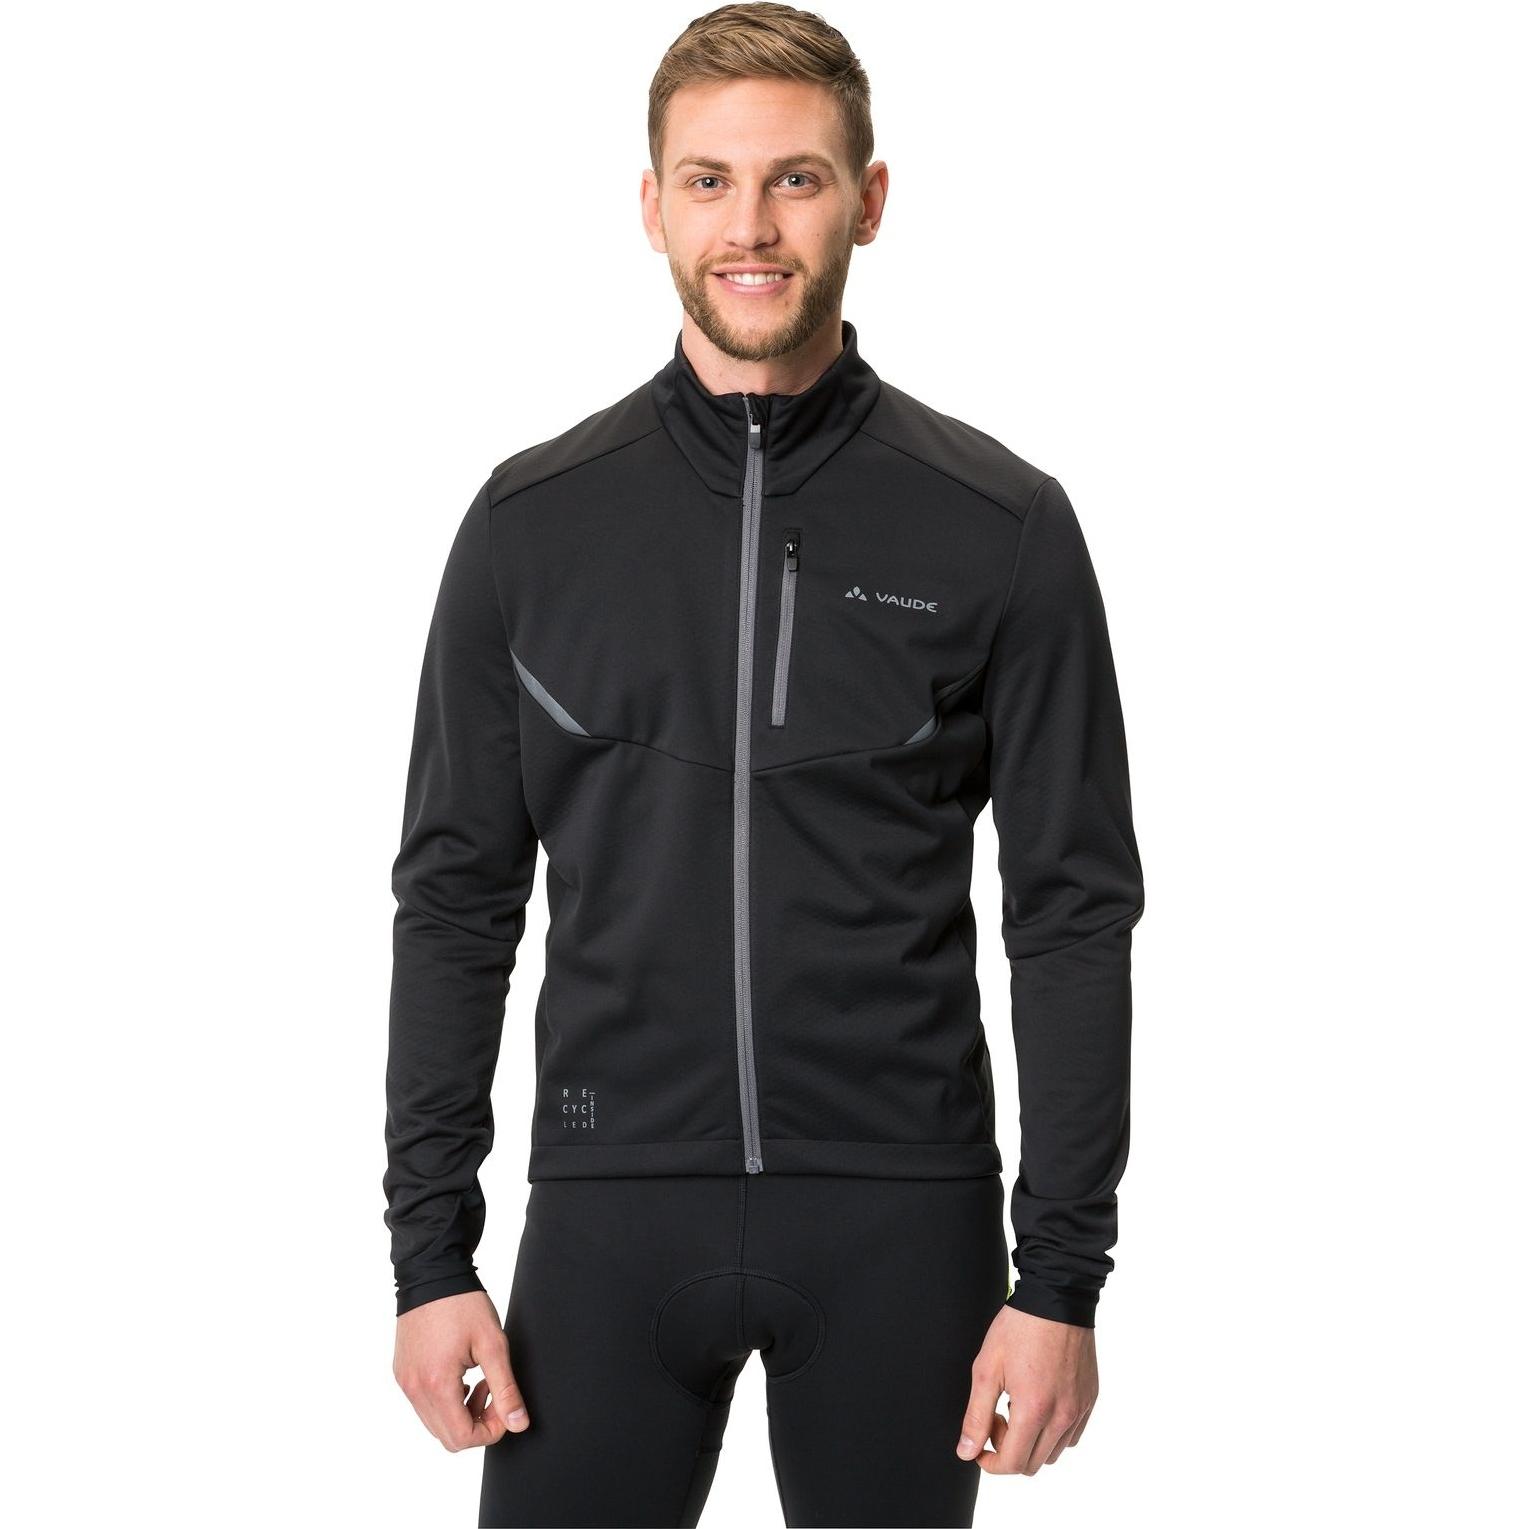 Image of Vaude Men's Kuro Softshell Jacket - black